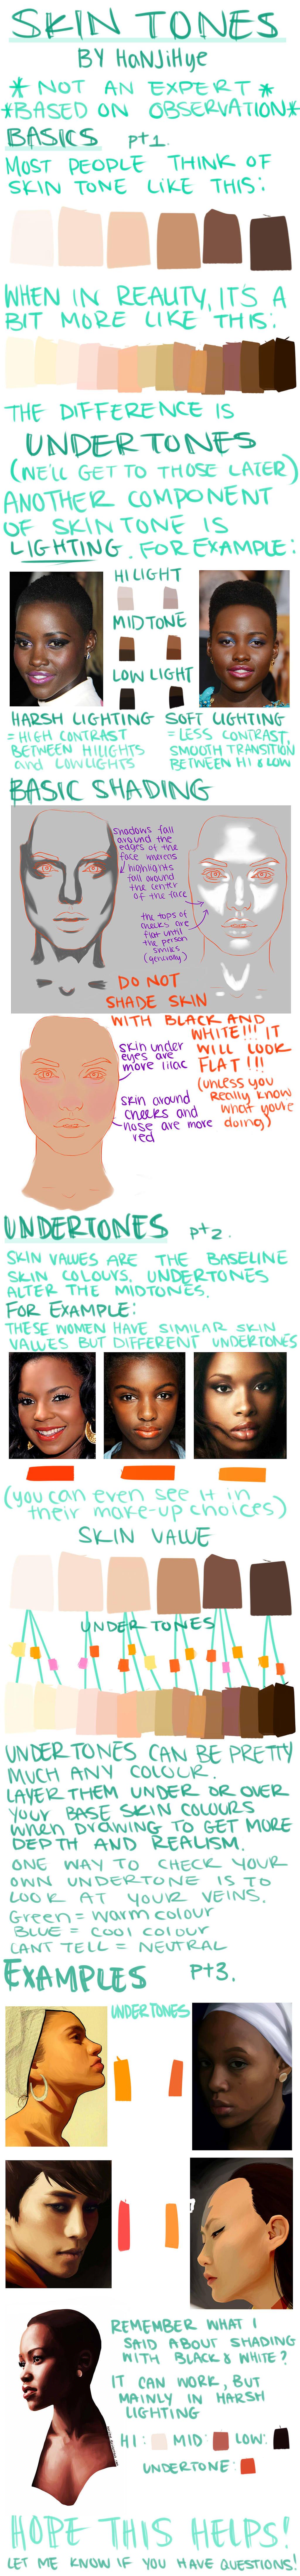 Skin Tones by HaNJiHye